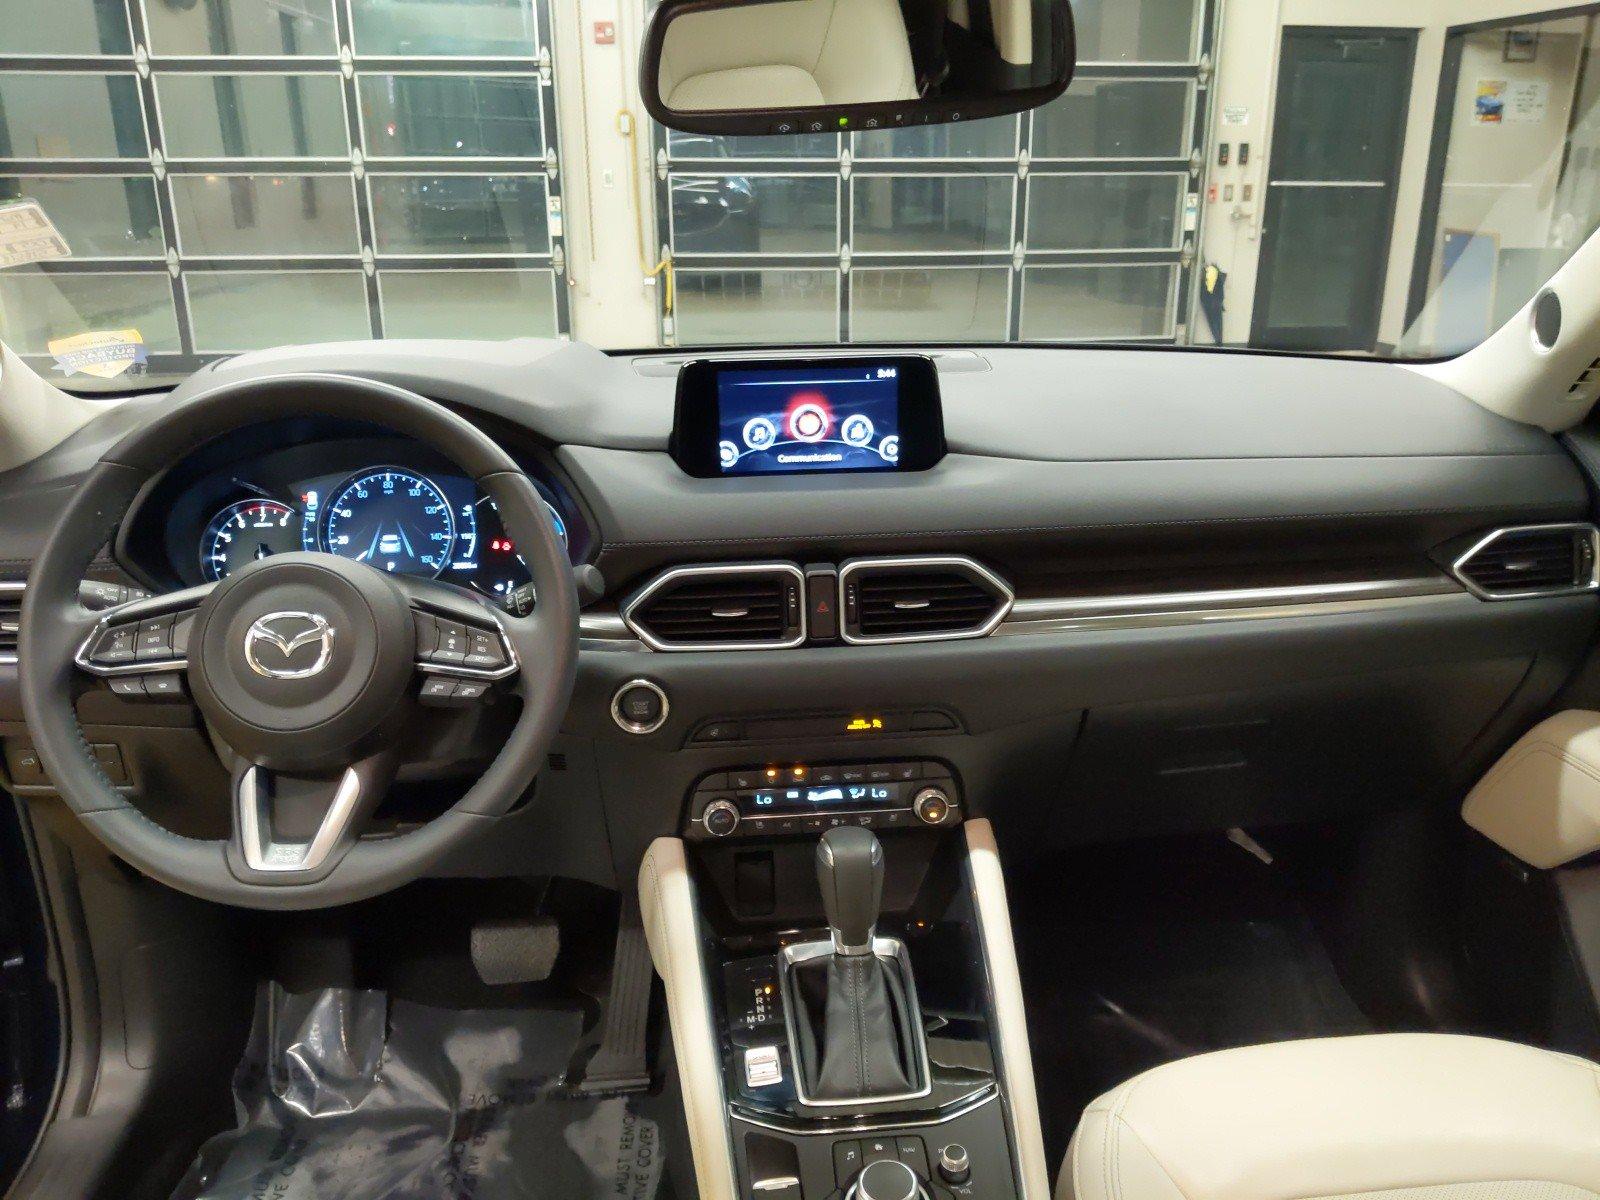 Used 2019 Mazda CX-5 Grand Touring Sport Utility for sale in Lincoln NE